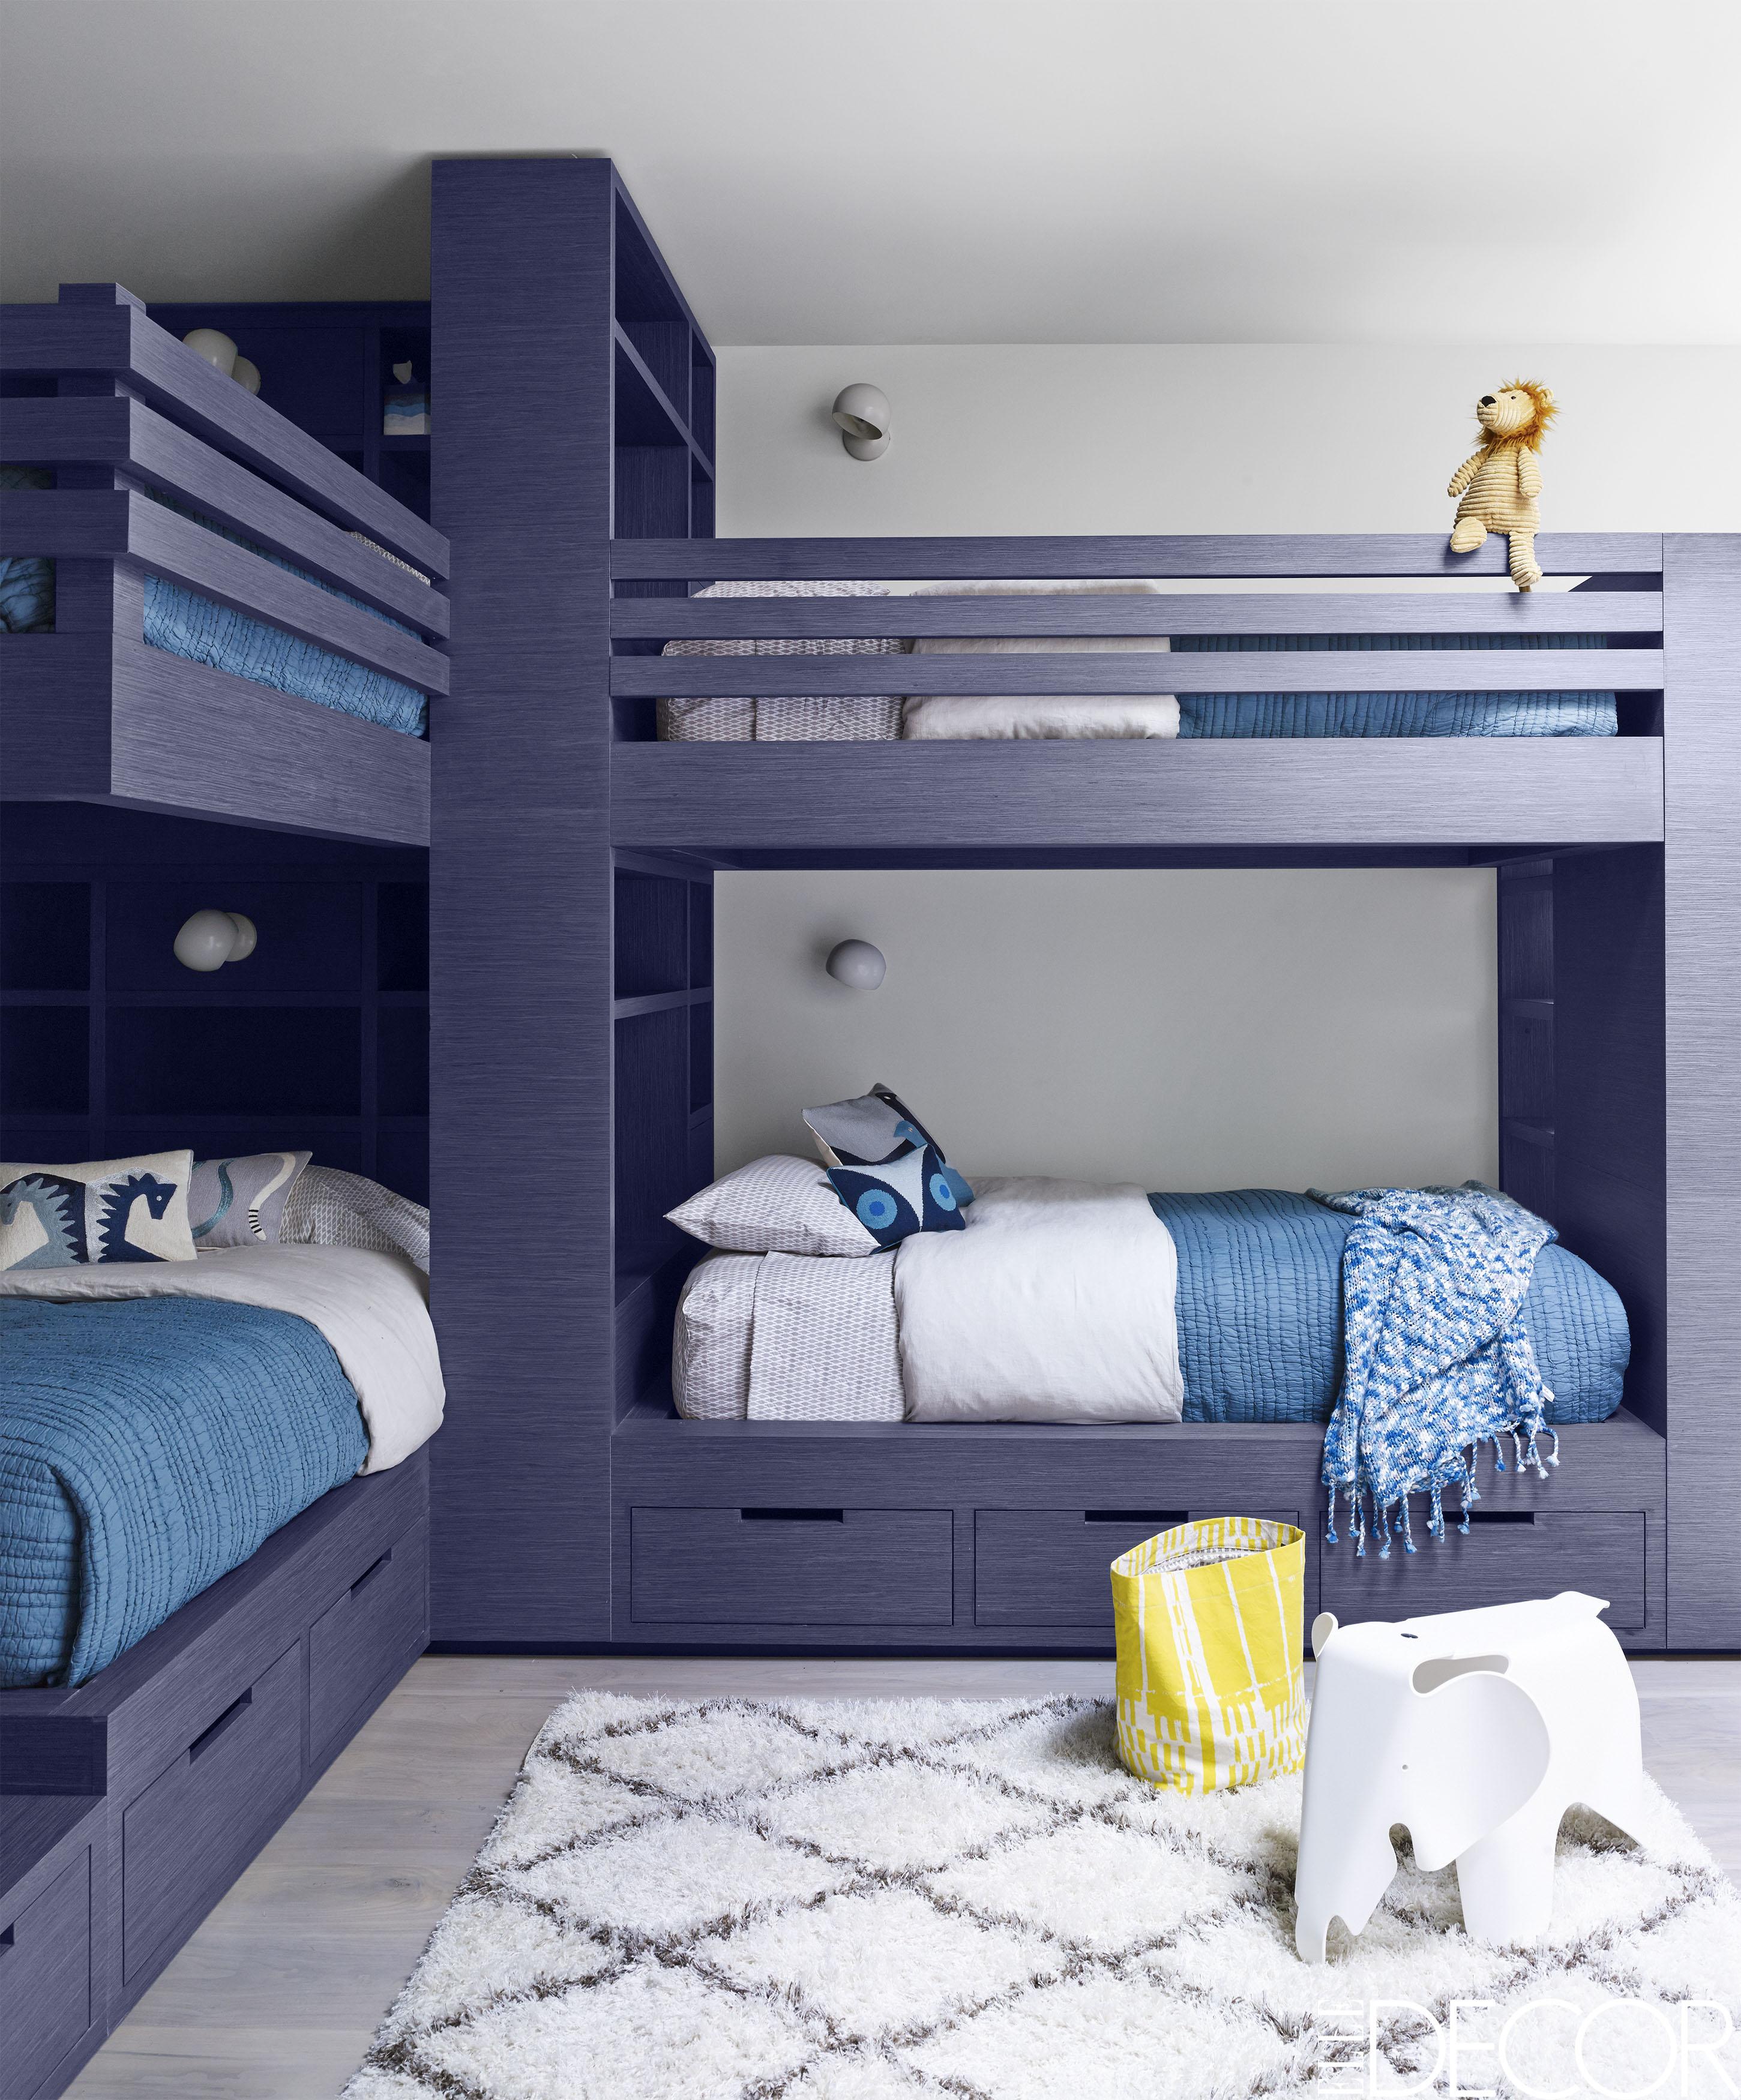 15 cool boys bedroom ideas - decorating a little boy room YYJMBOQ